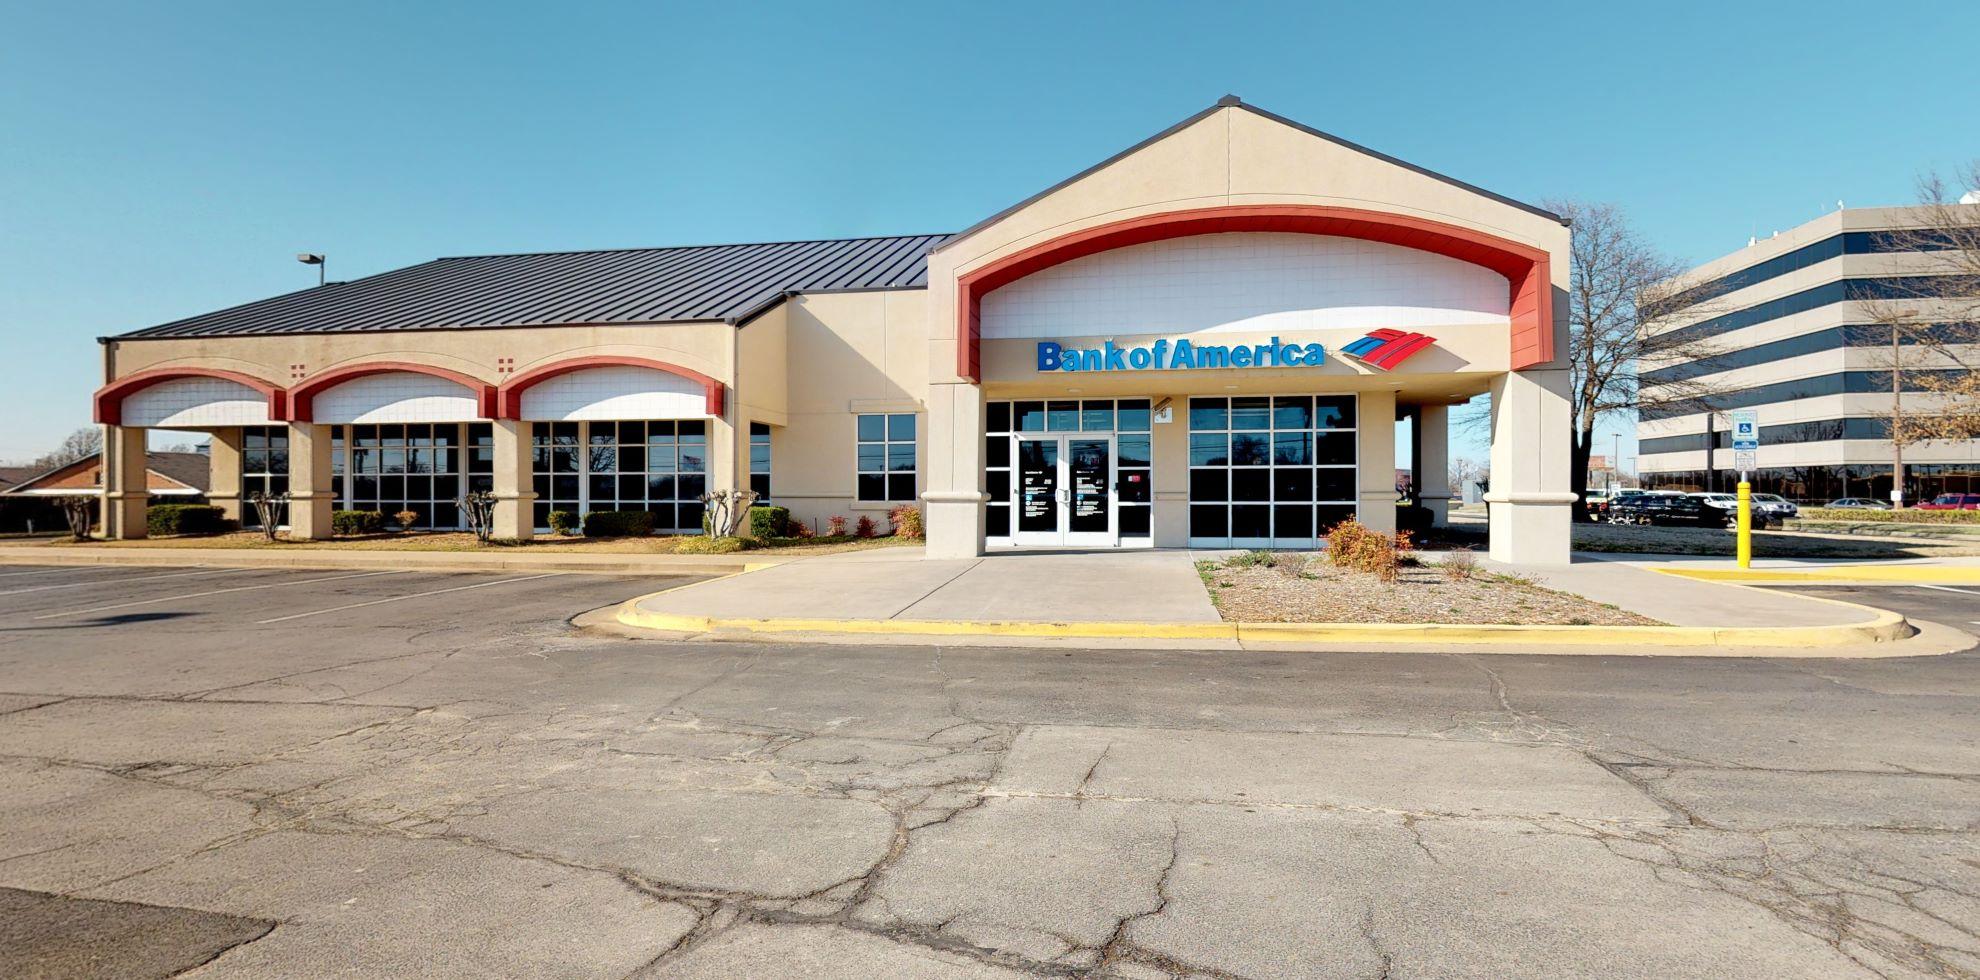 Bank of America financial center with drive-thru ATM | 10131 E 11th St, Tulsa, OK 74128